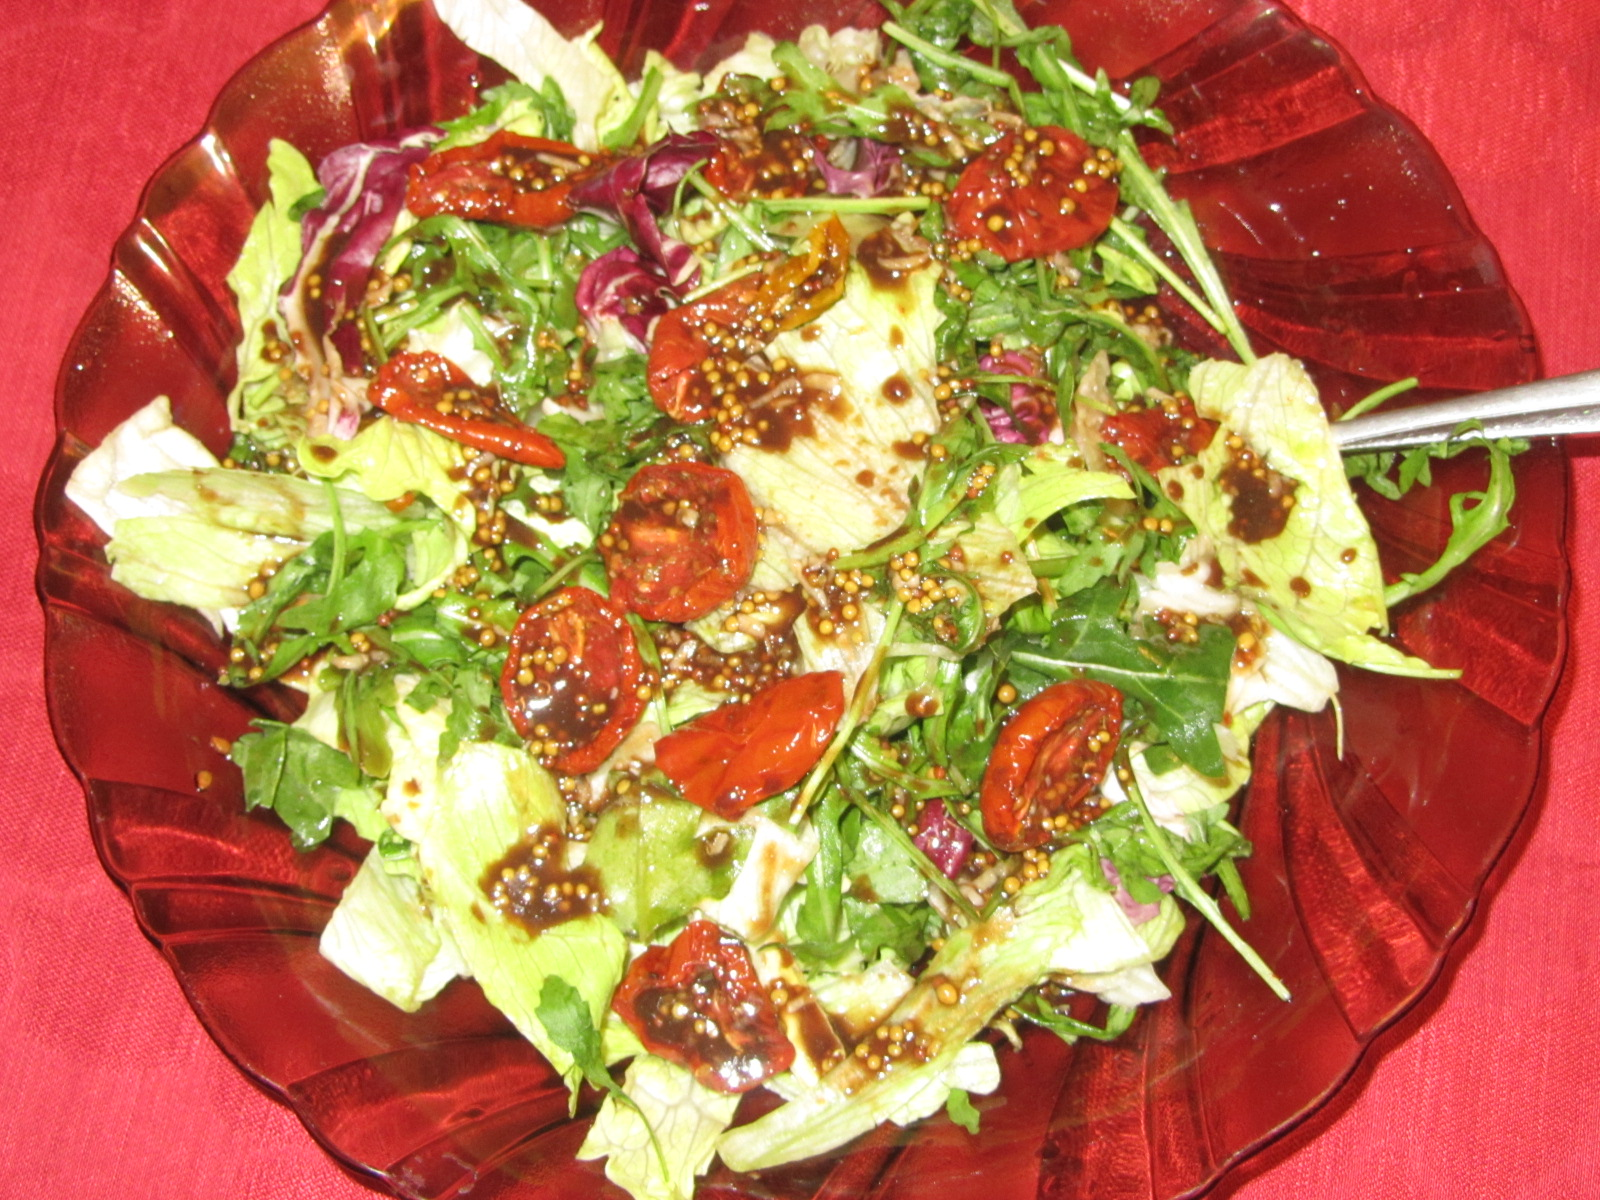 Салат с маслом рецепт с